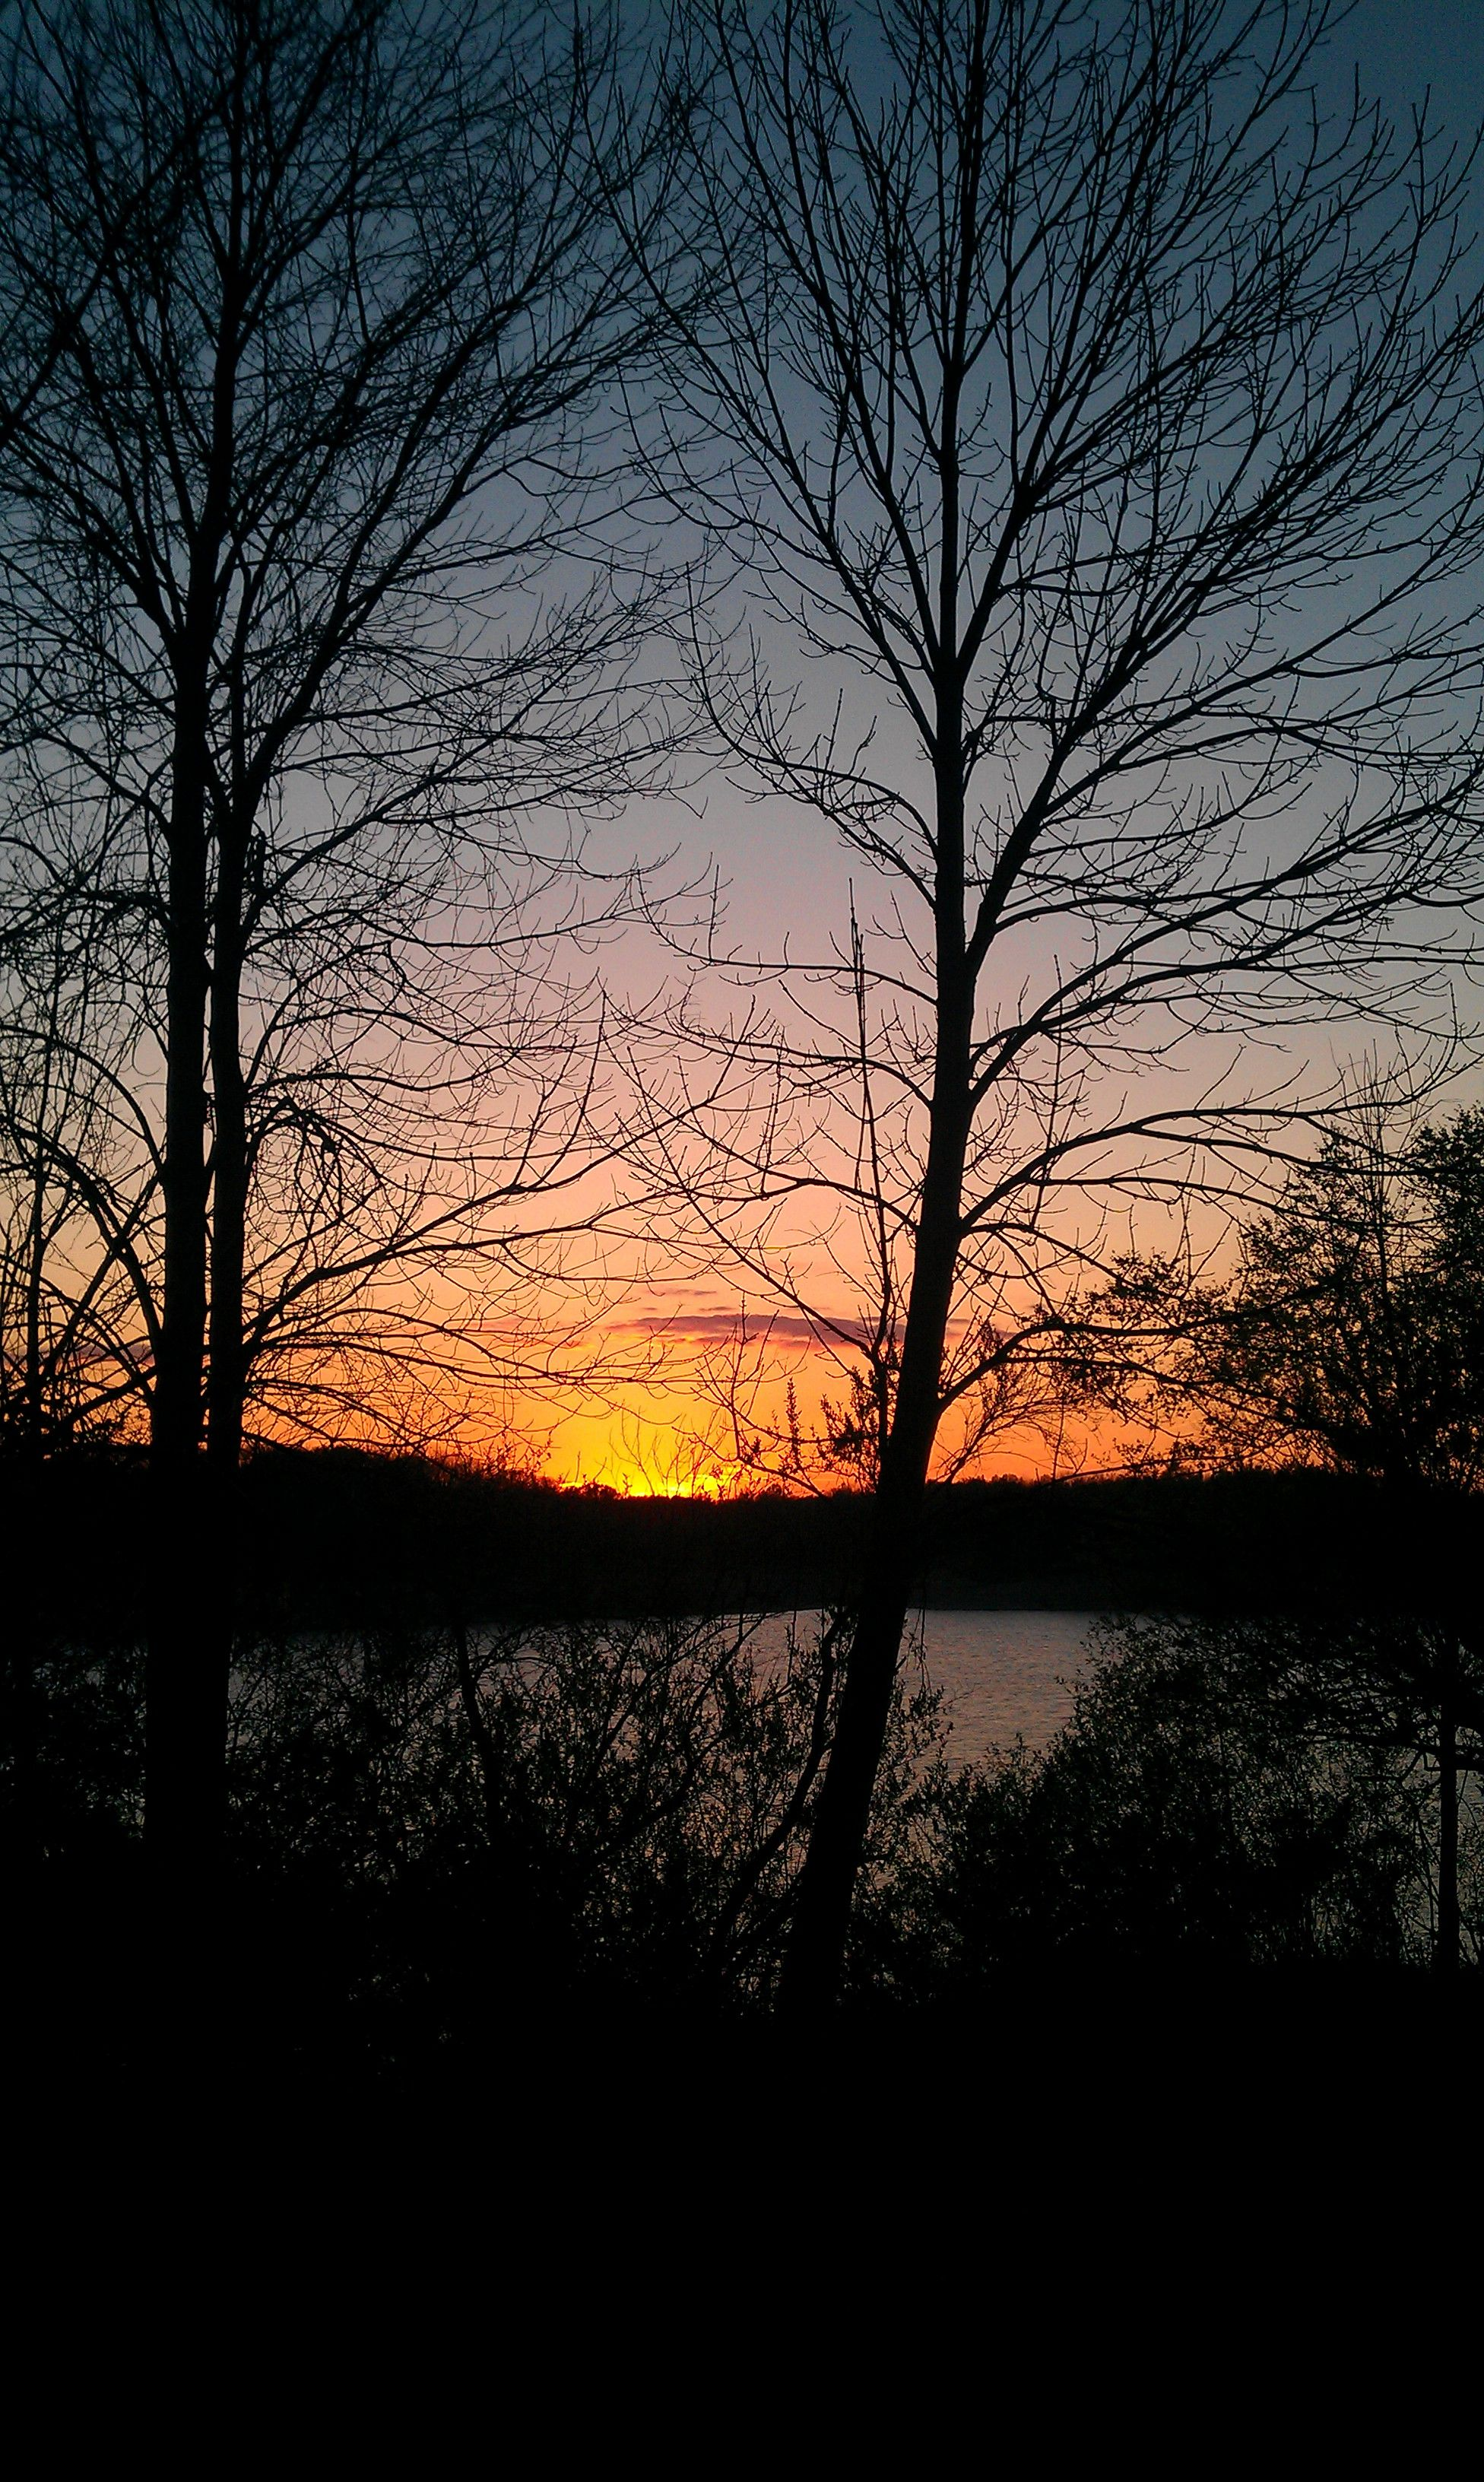 Salamonie State Park. It's okay, I know you're in awe of